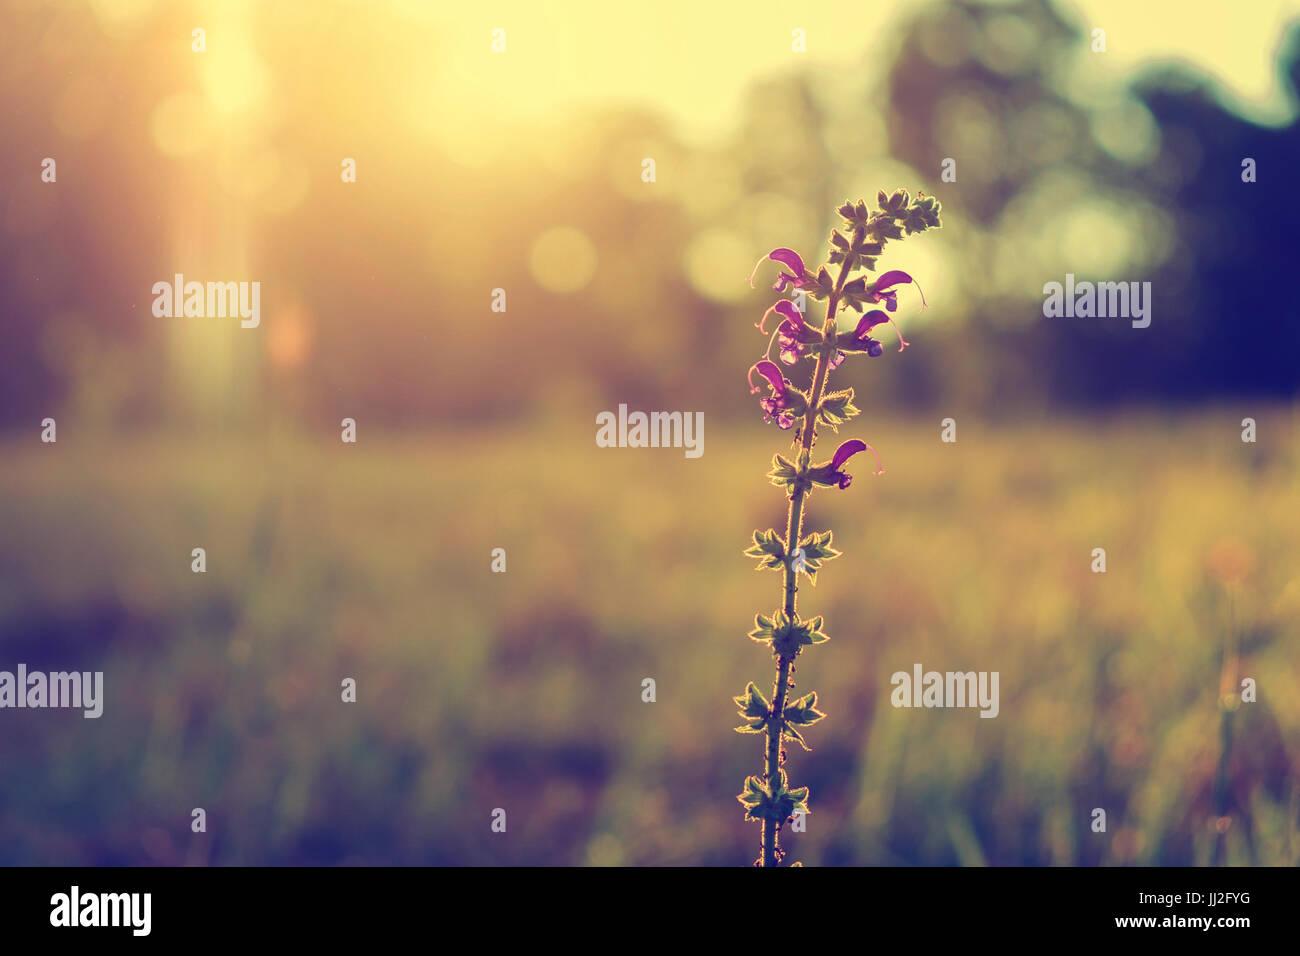 Violeta flor silvestre en Sunset Imagen De Stock